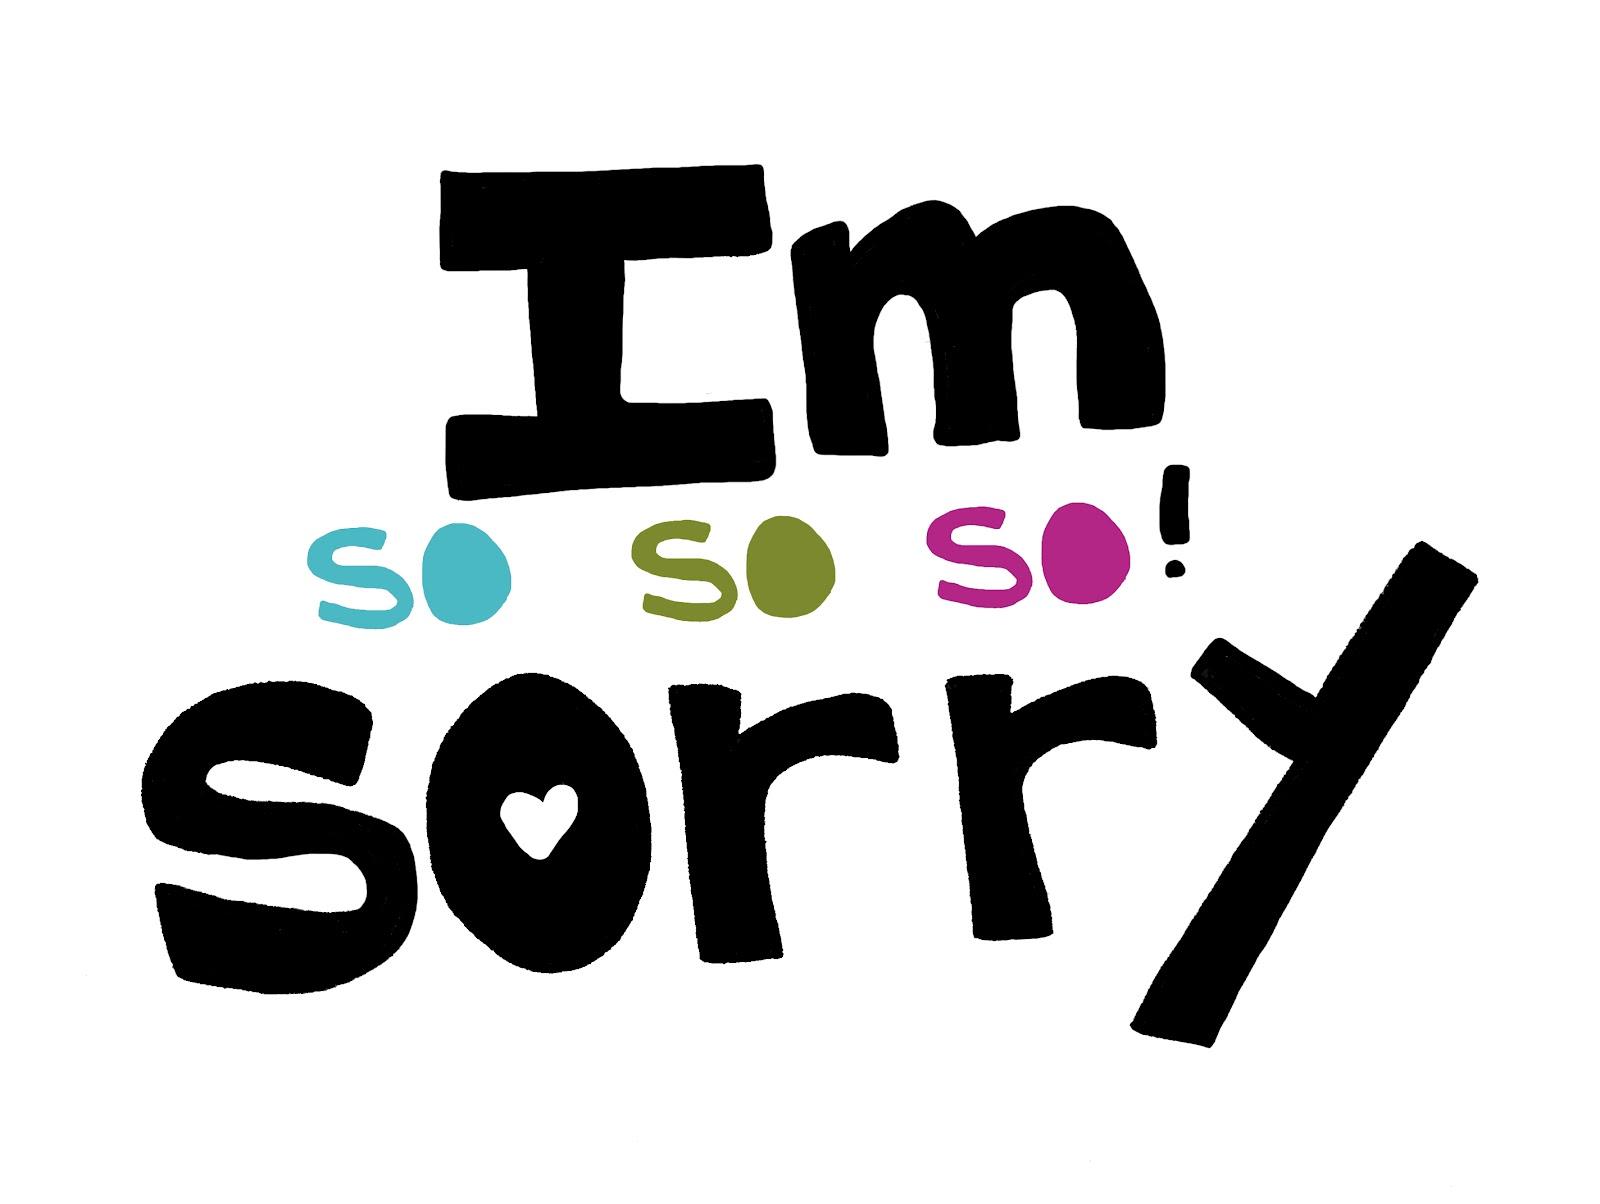 DEAR NISHAT I AM SORRY SORRY SORRY SORRY :'(: I am SoRrY Darling